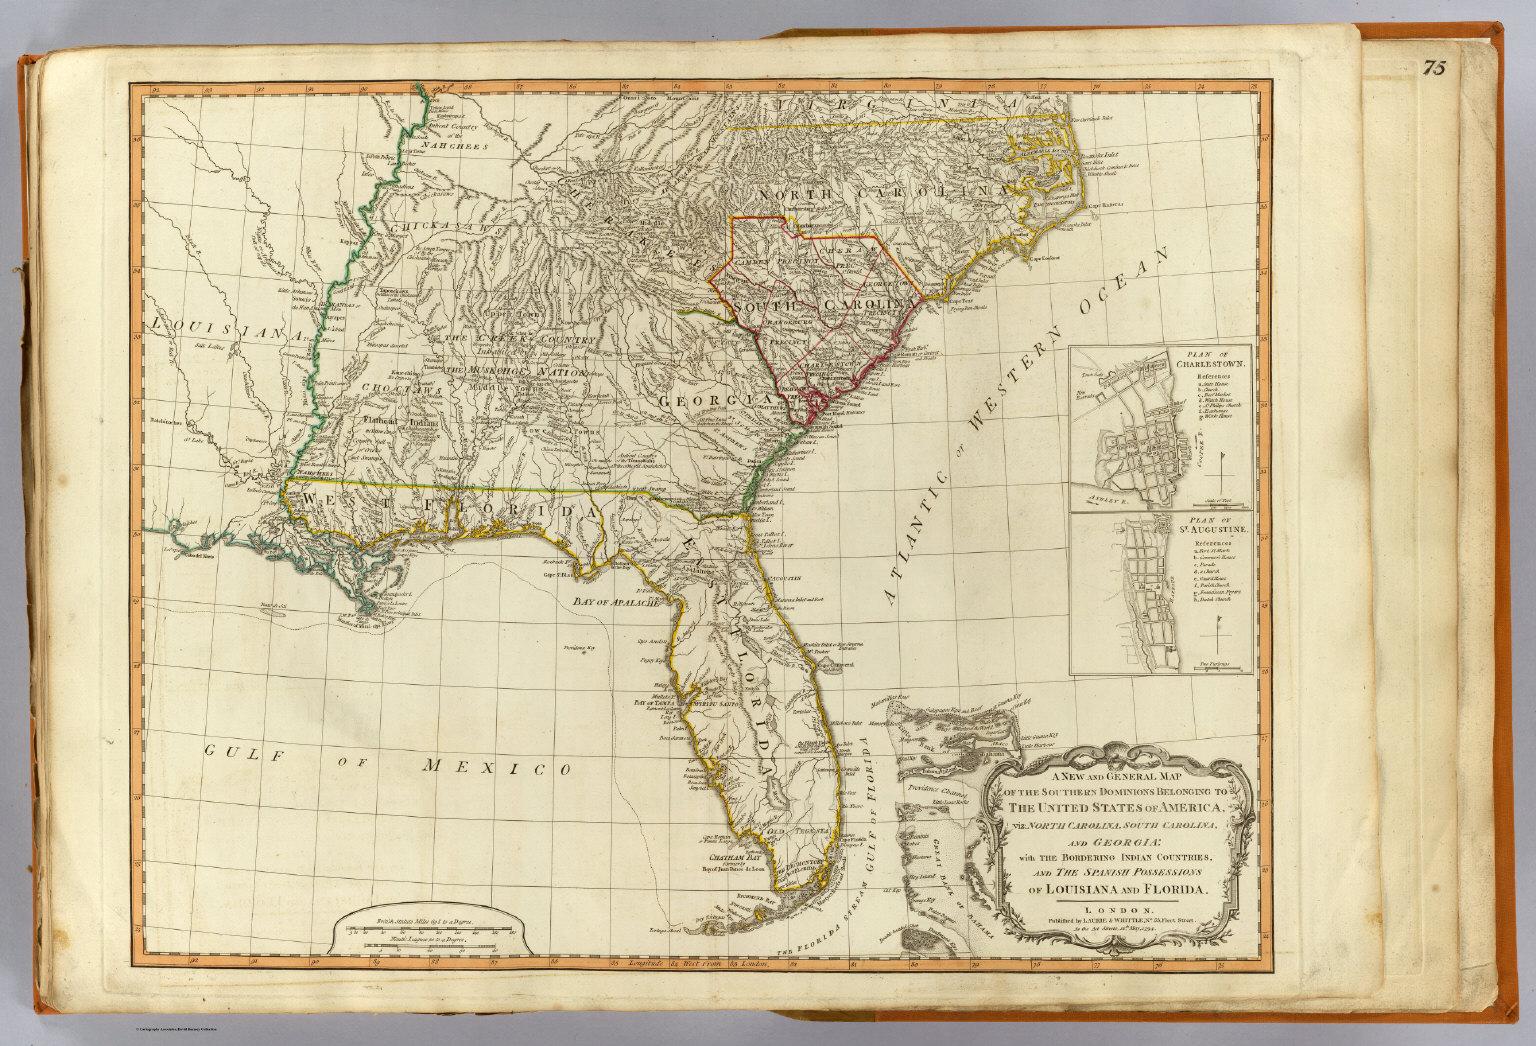 Southern dominions U.S.